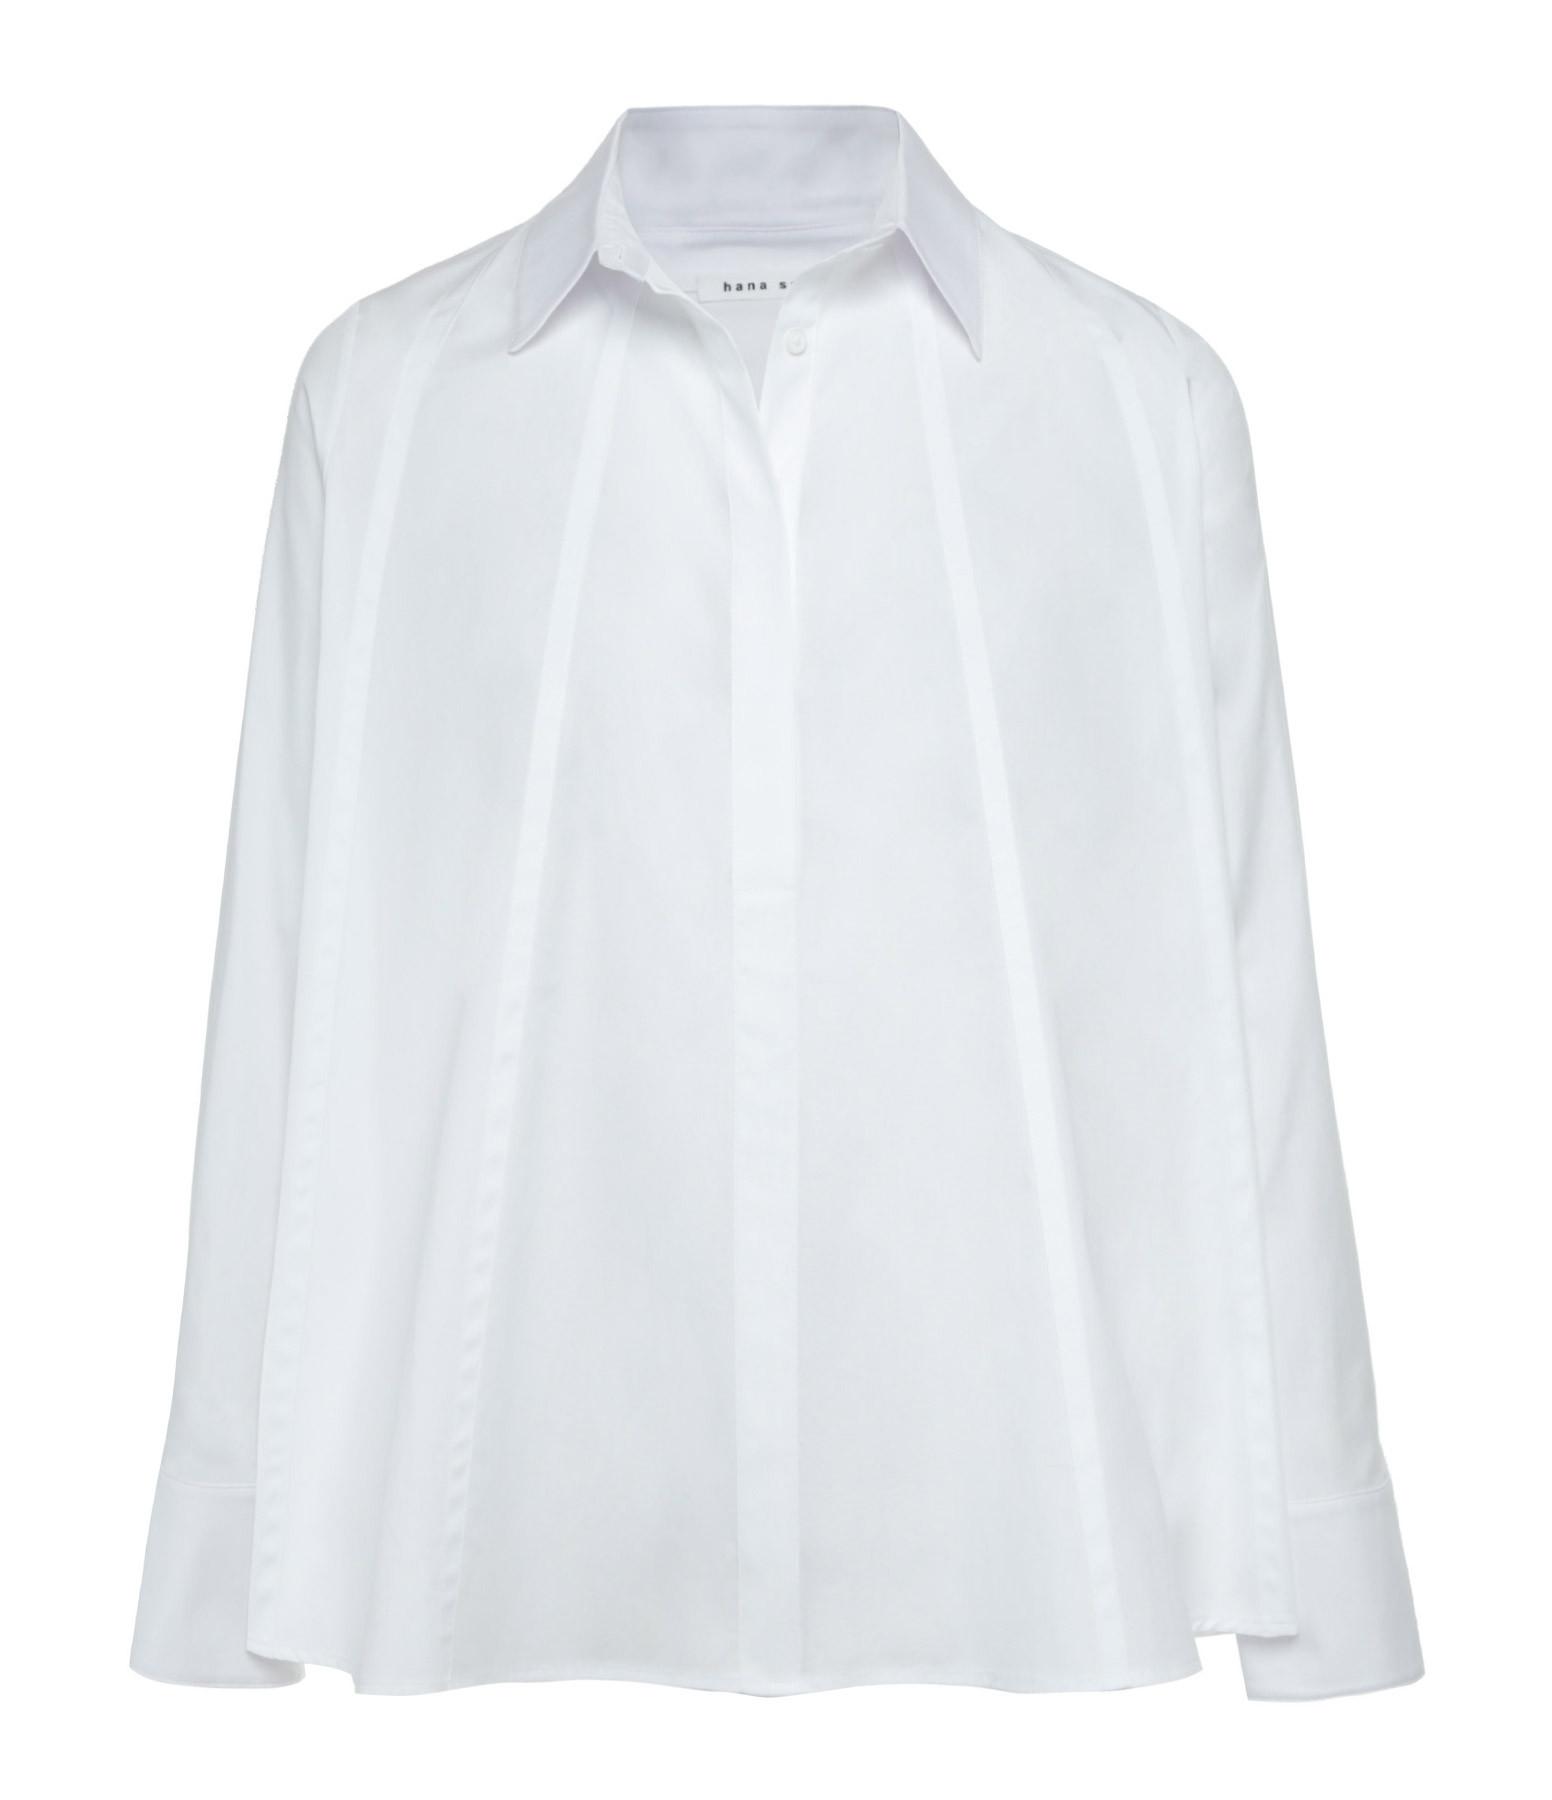 HANA SAN - Chemise Jiroh Blanc Optique